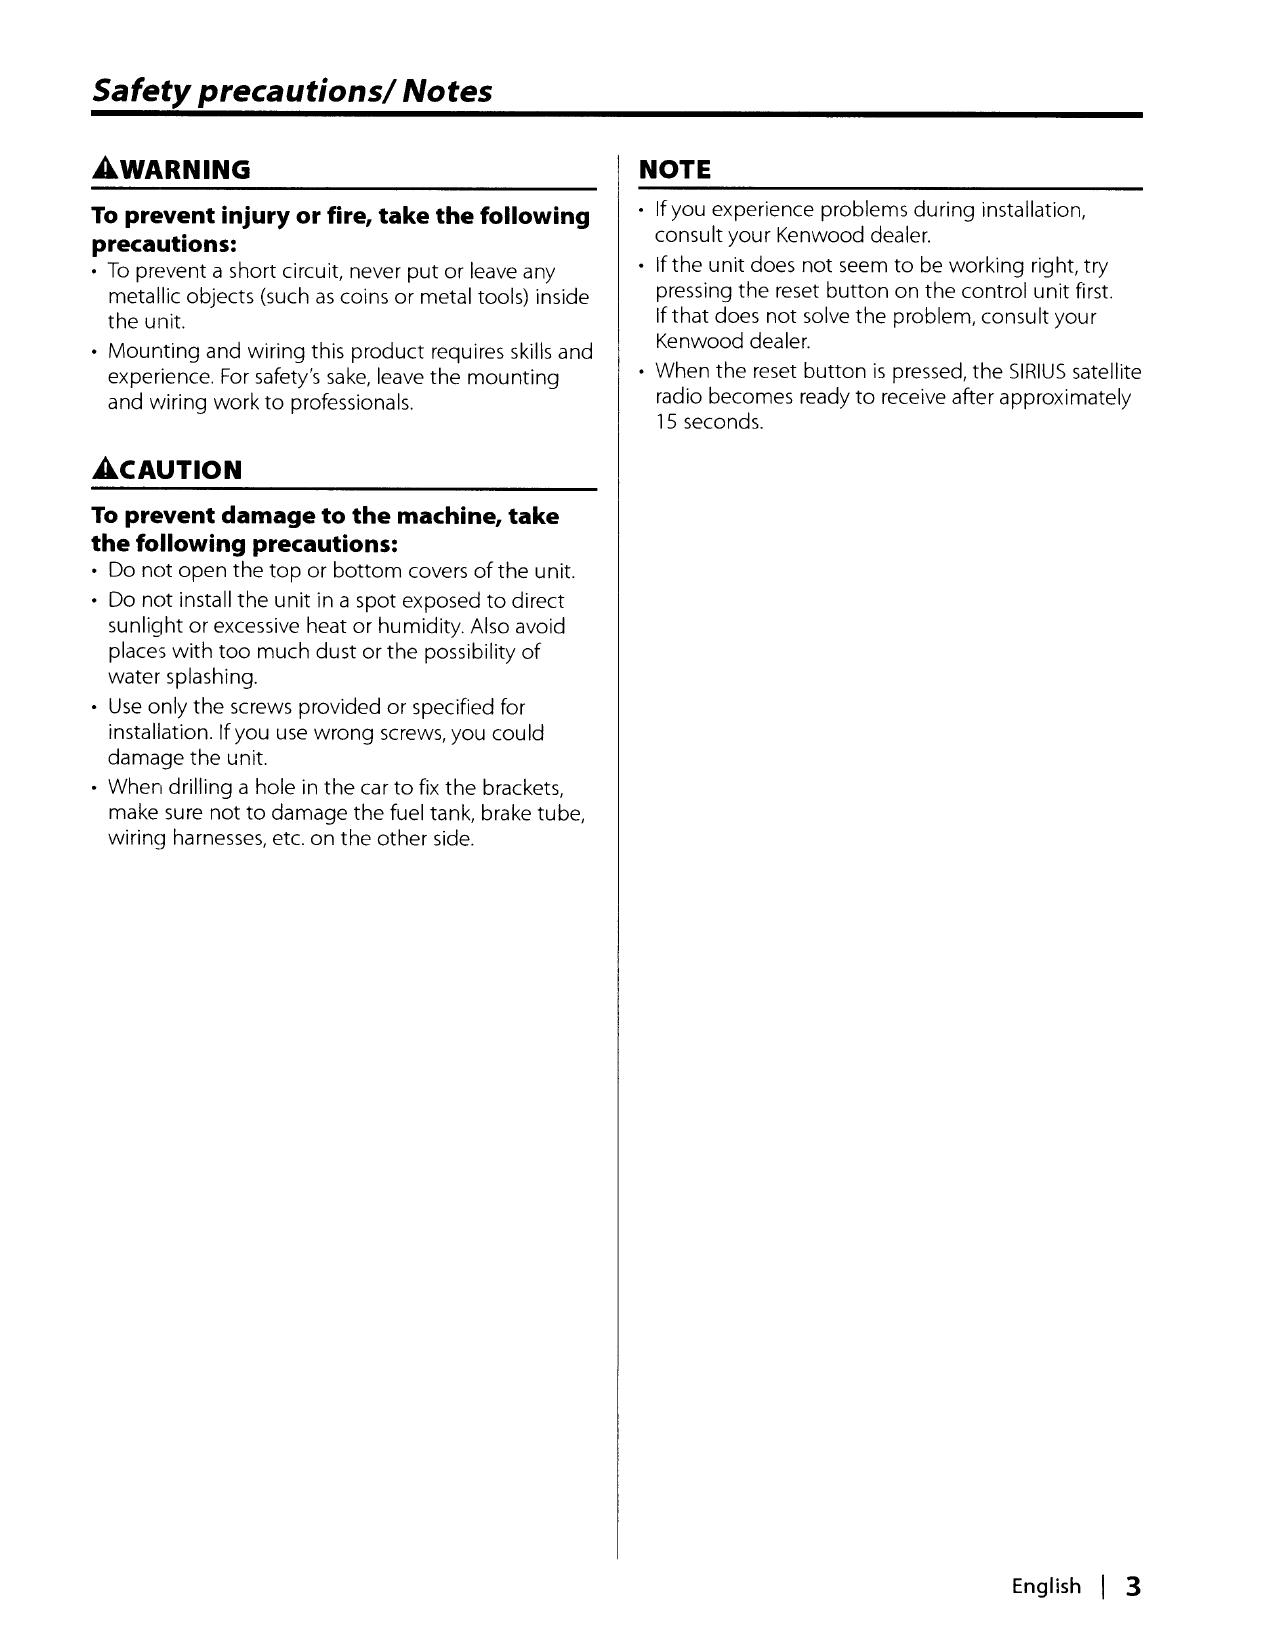 PDF manual for Kenwood Car Receiver KDC-3028